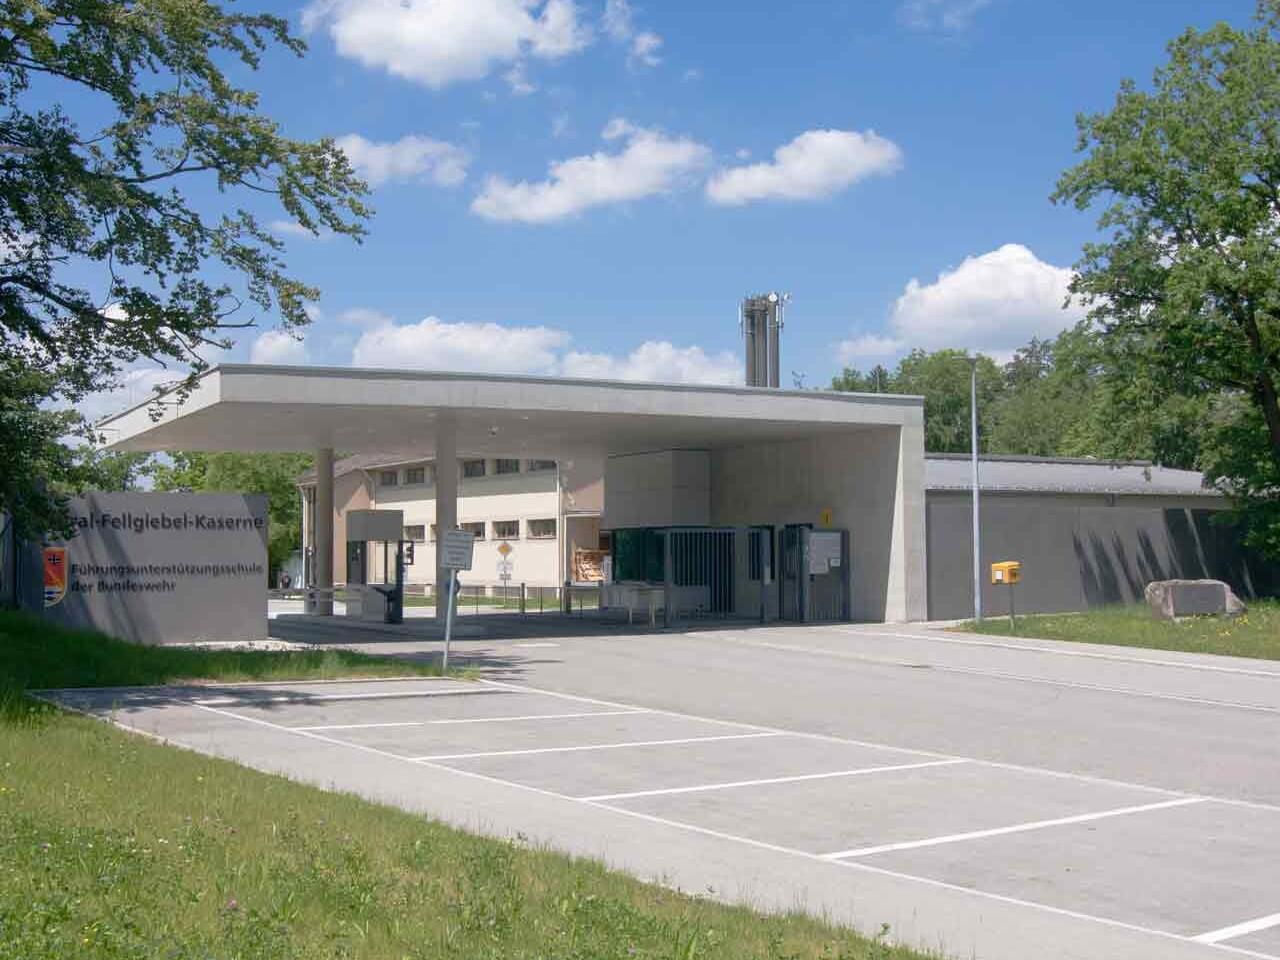 Torwachgebäude General-Fellgiebel-Kaserne, Pöcking